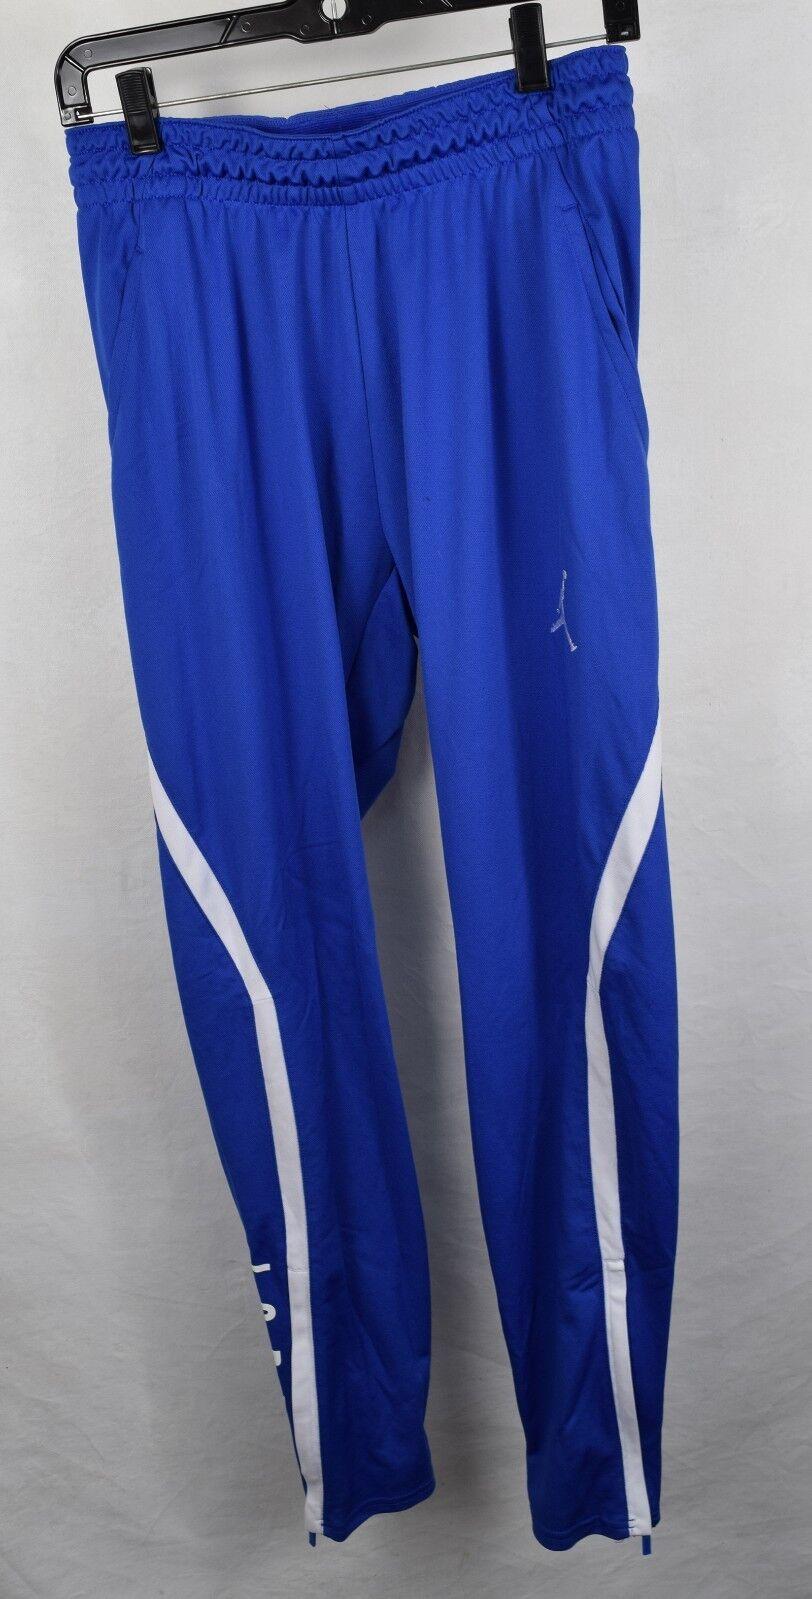 Jordan 889711-480 Mens 23 Alpha Dry Pants Fit Athletic Training Sports bluee M